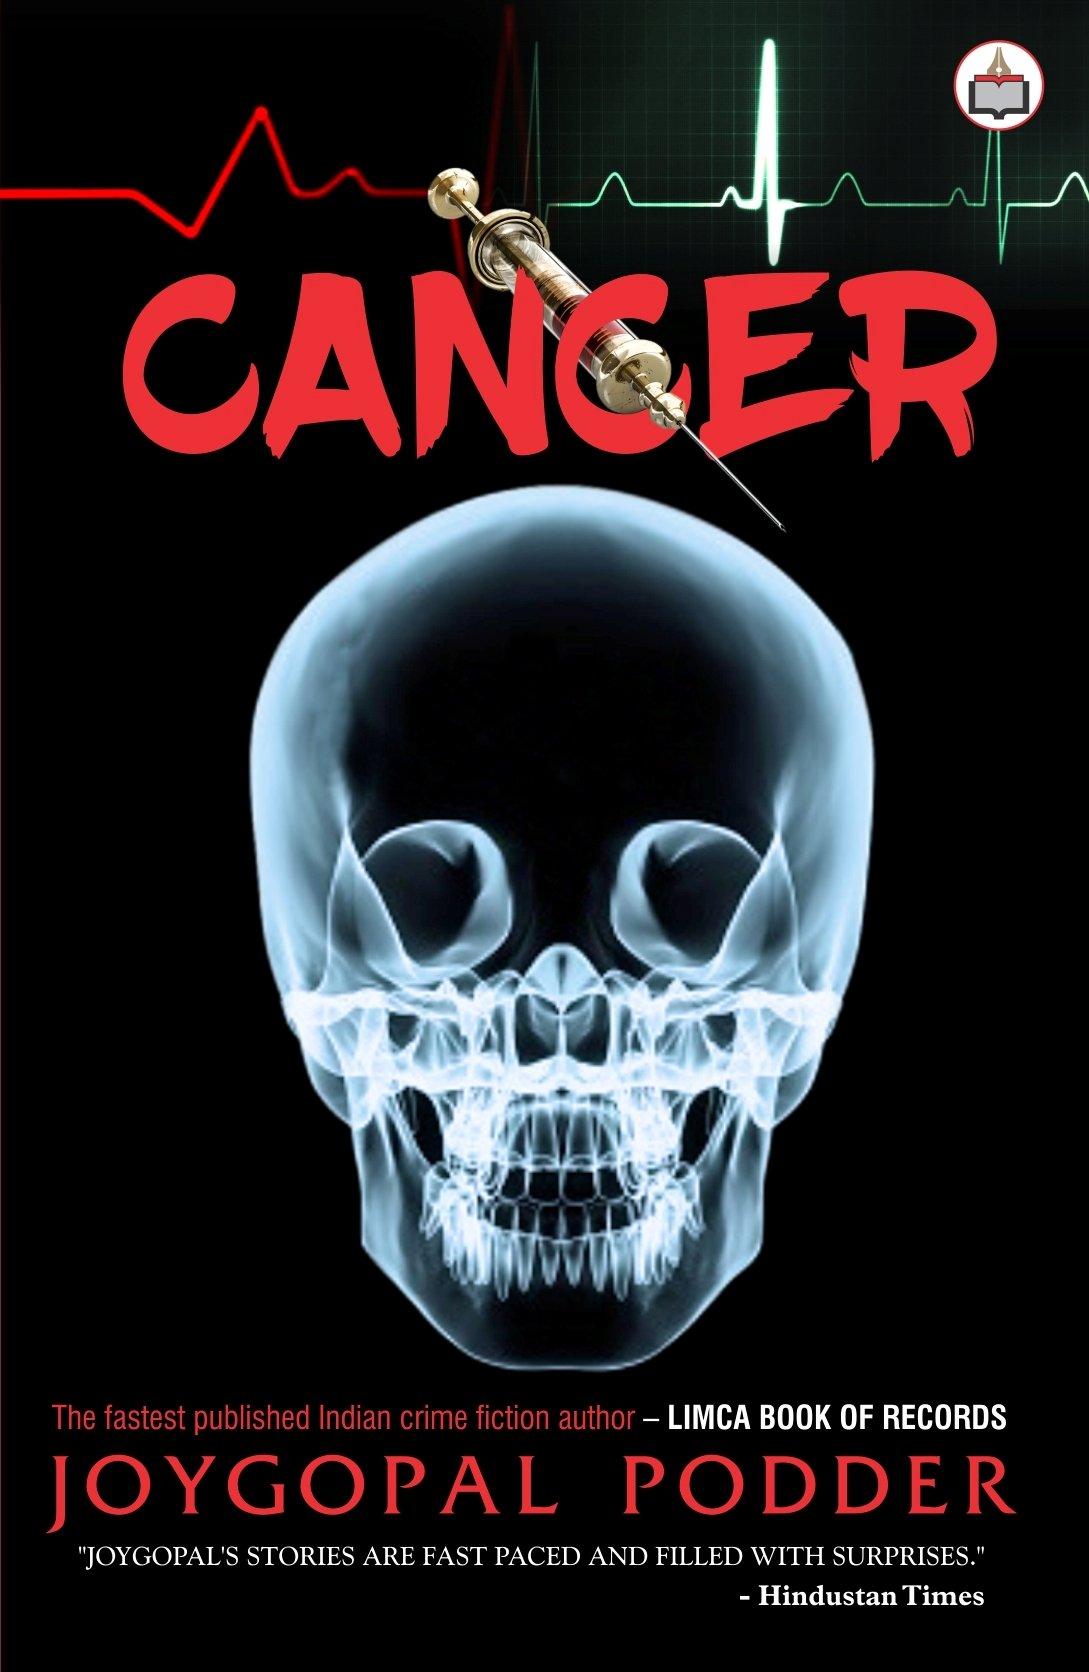 Cancer by Joygopal Podder